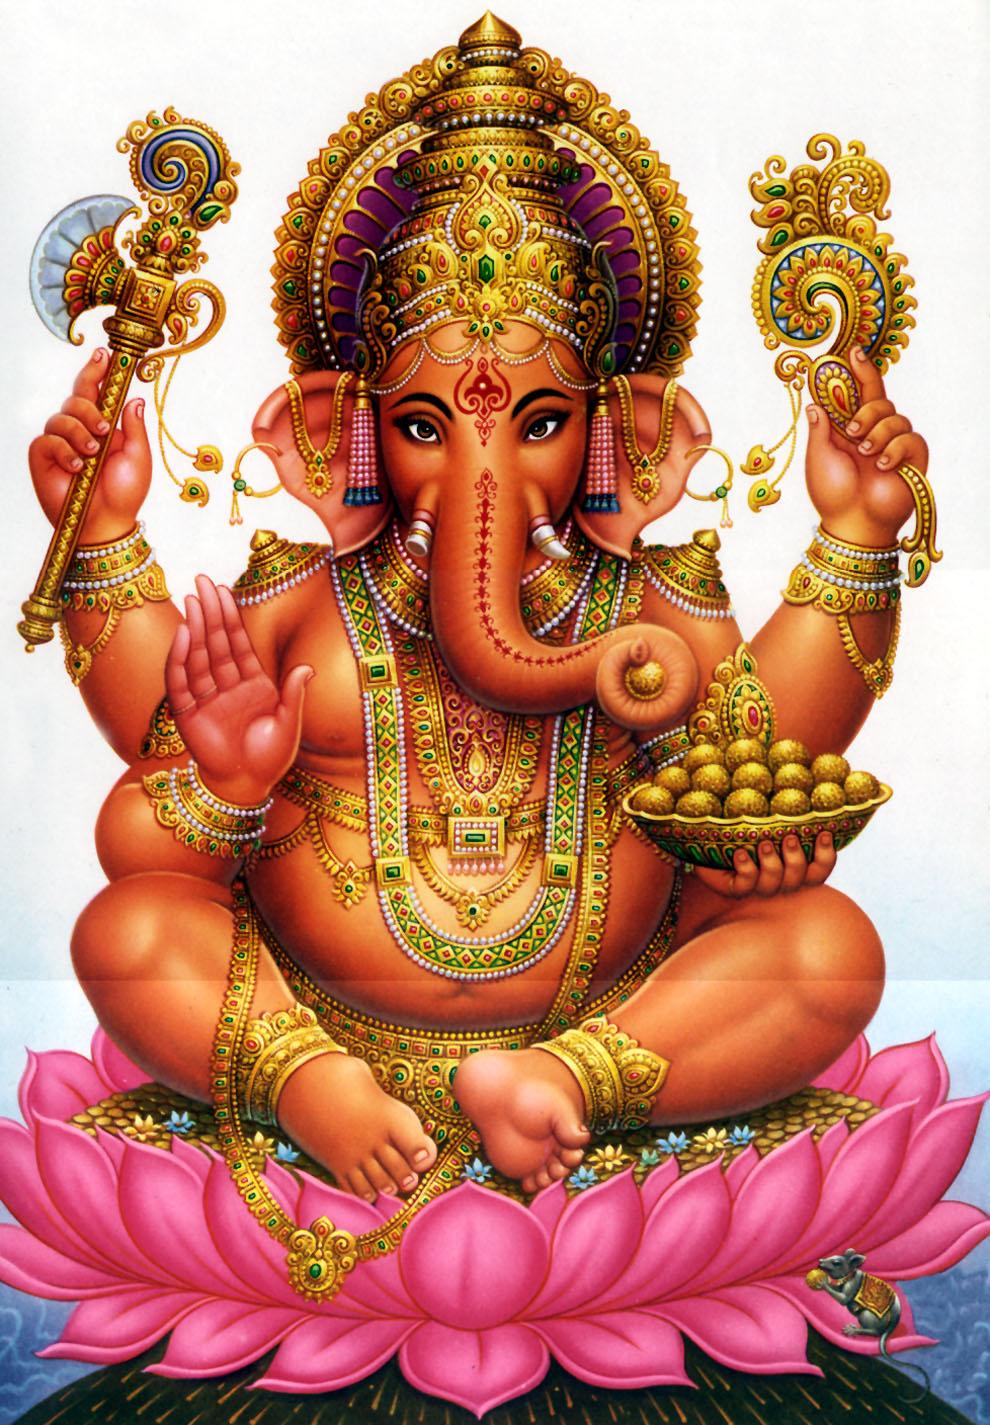 Bhagwan ji help me lord shri ganesh latest hd wallpapers - Ganesh bhagwan image hd ...